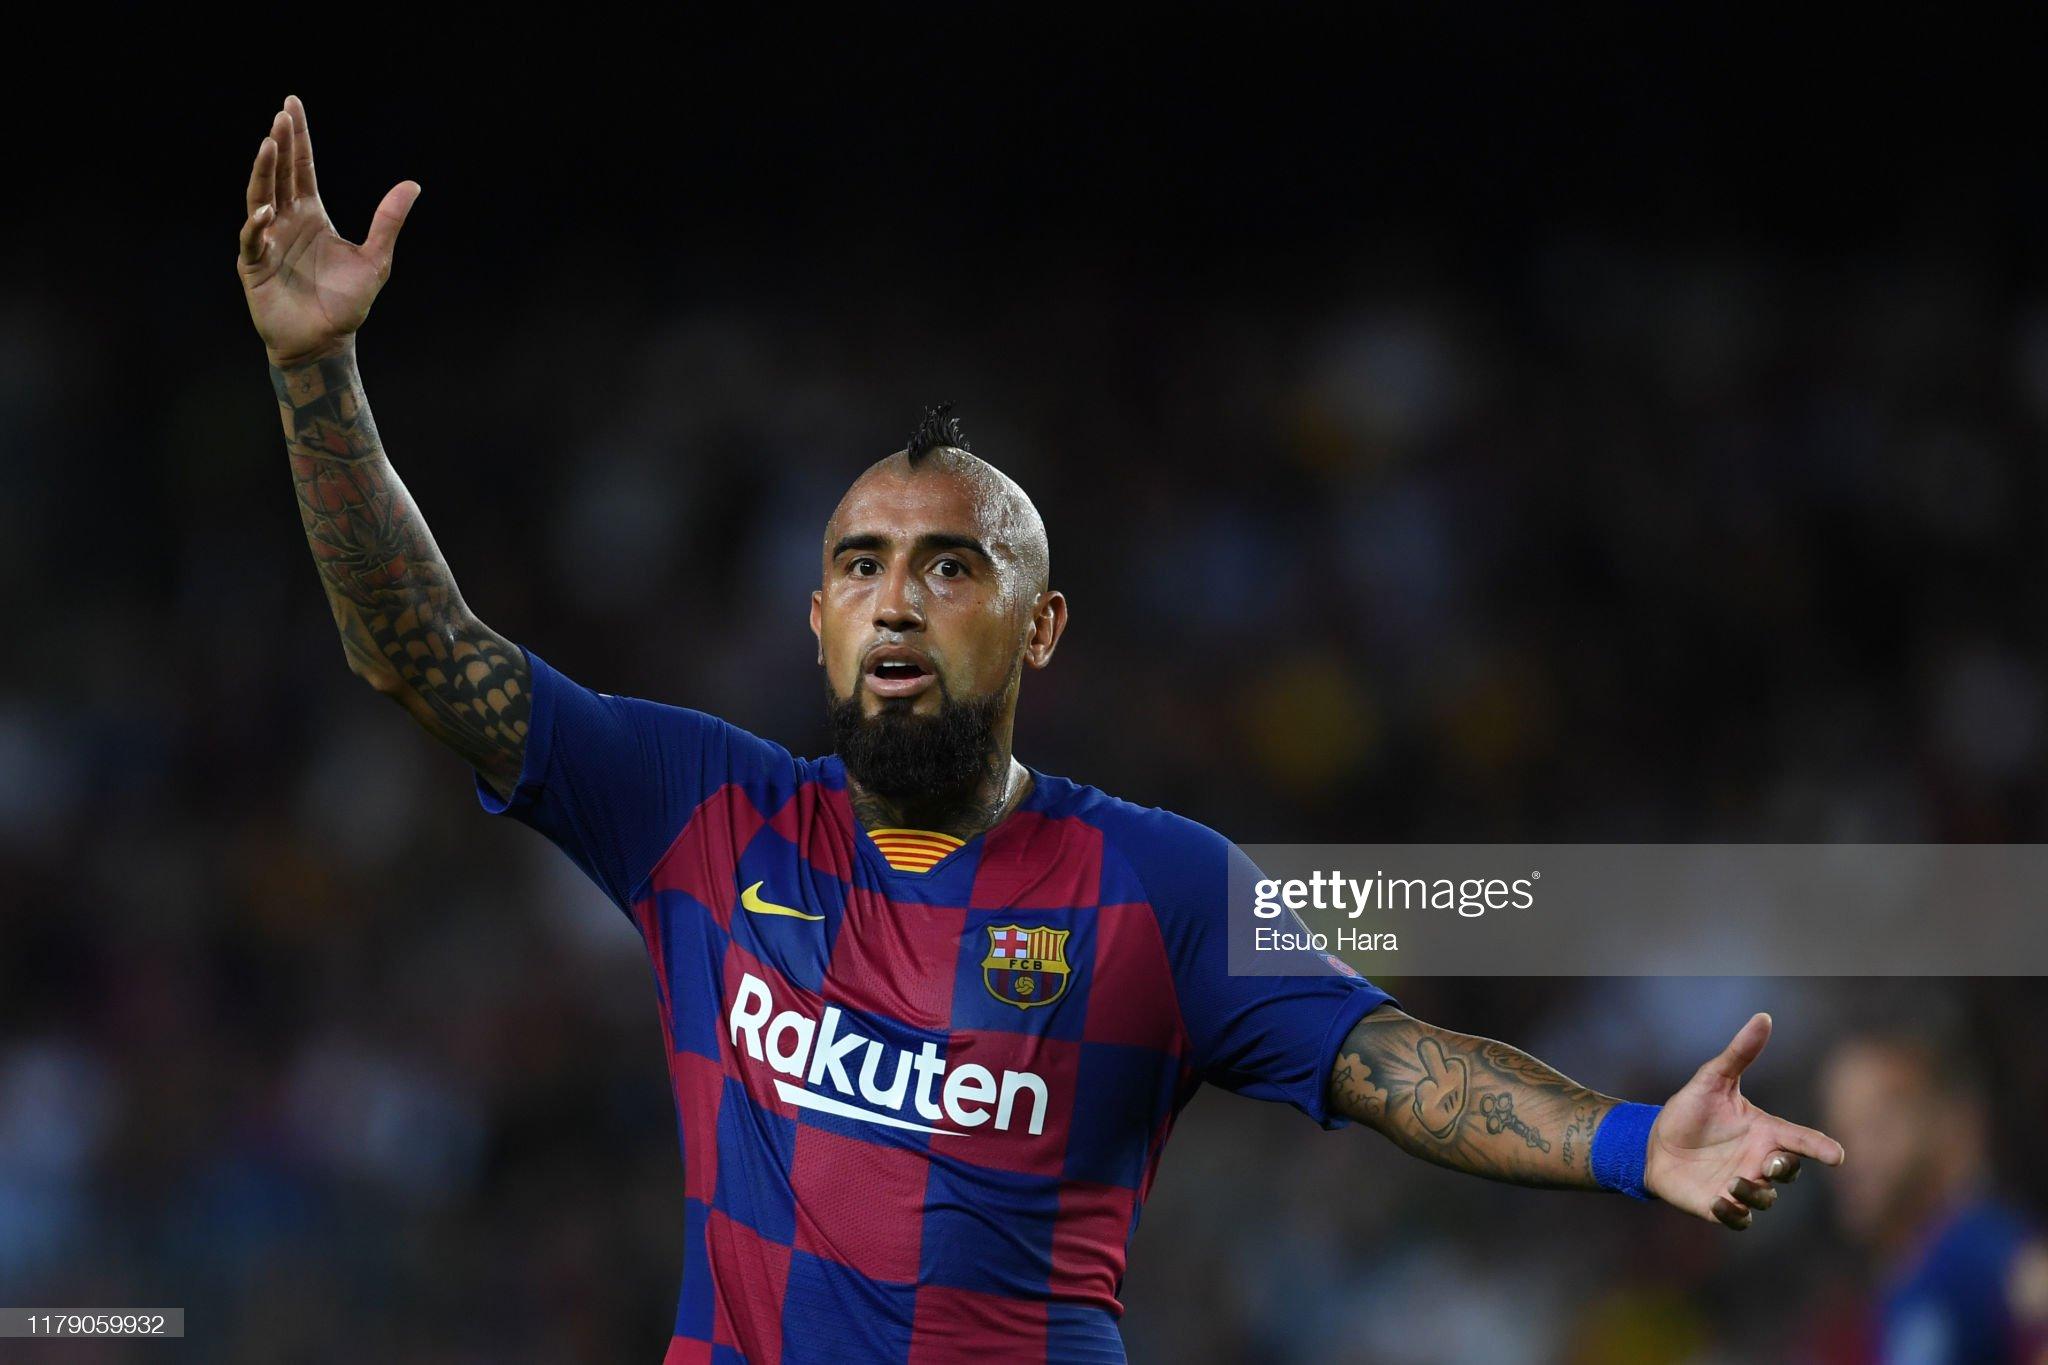 صور مباراة : برشلونة - إنتر 2-1 ( 02-10-2019 )  Arturo-vidal-of-fc-barcelona-reacts-during-the-uefa-champions-league-picture-id1179059932?s=2048x2048